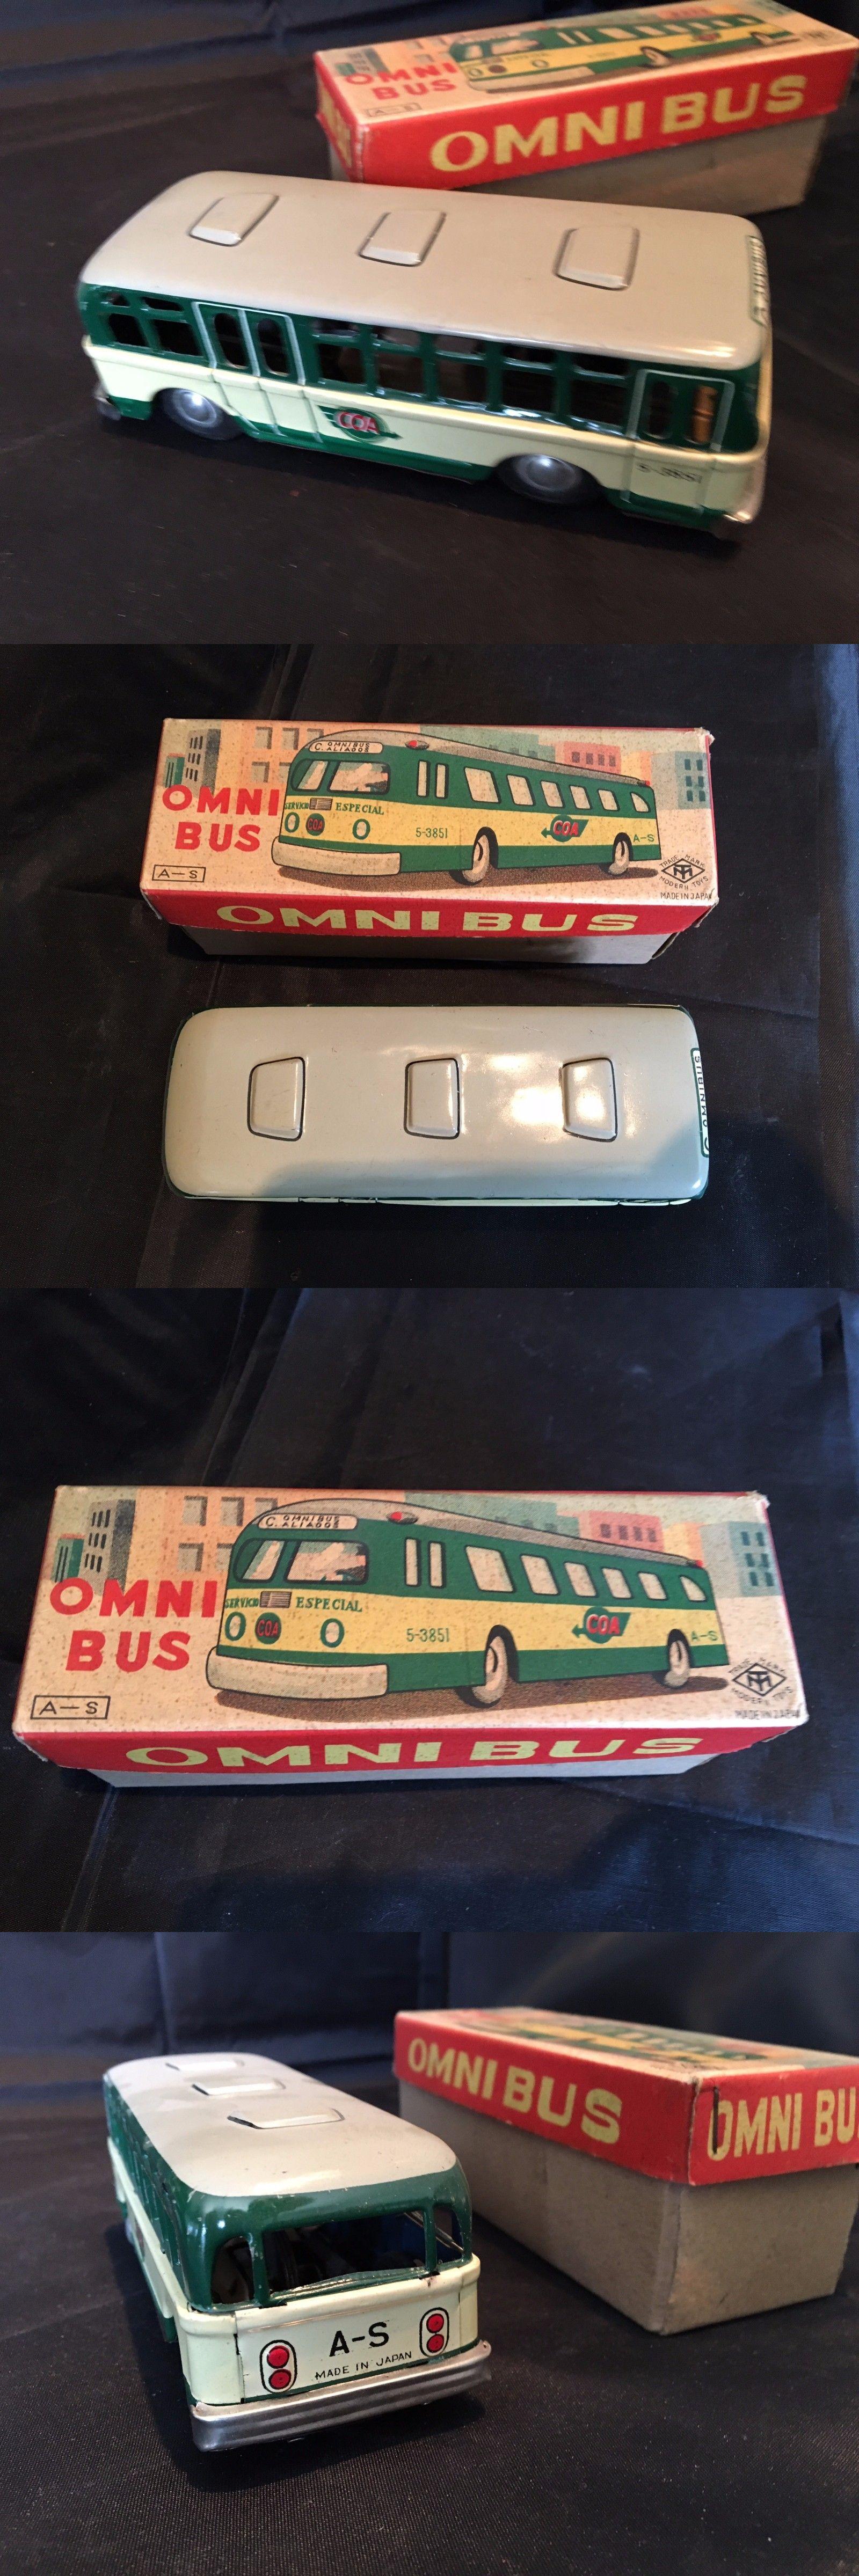 1960 toys images  Vehicles  Vintage Mib Tin Toy Bus Modern Toys Japan  Mega